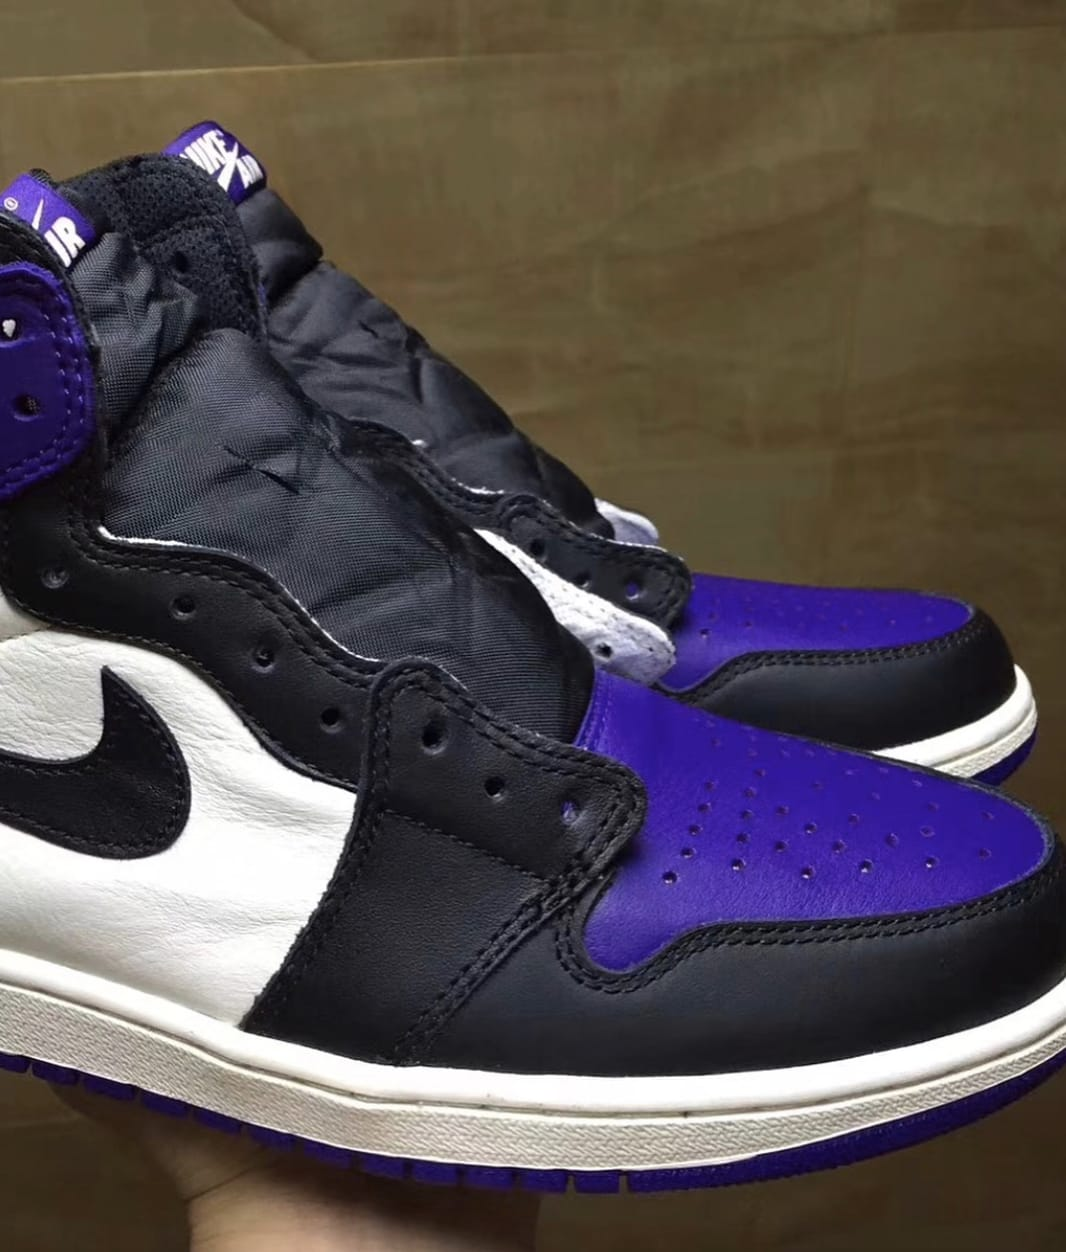 Air Jordan 1 'Court Purple' 3